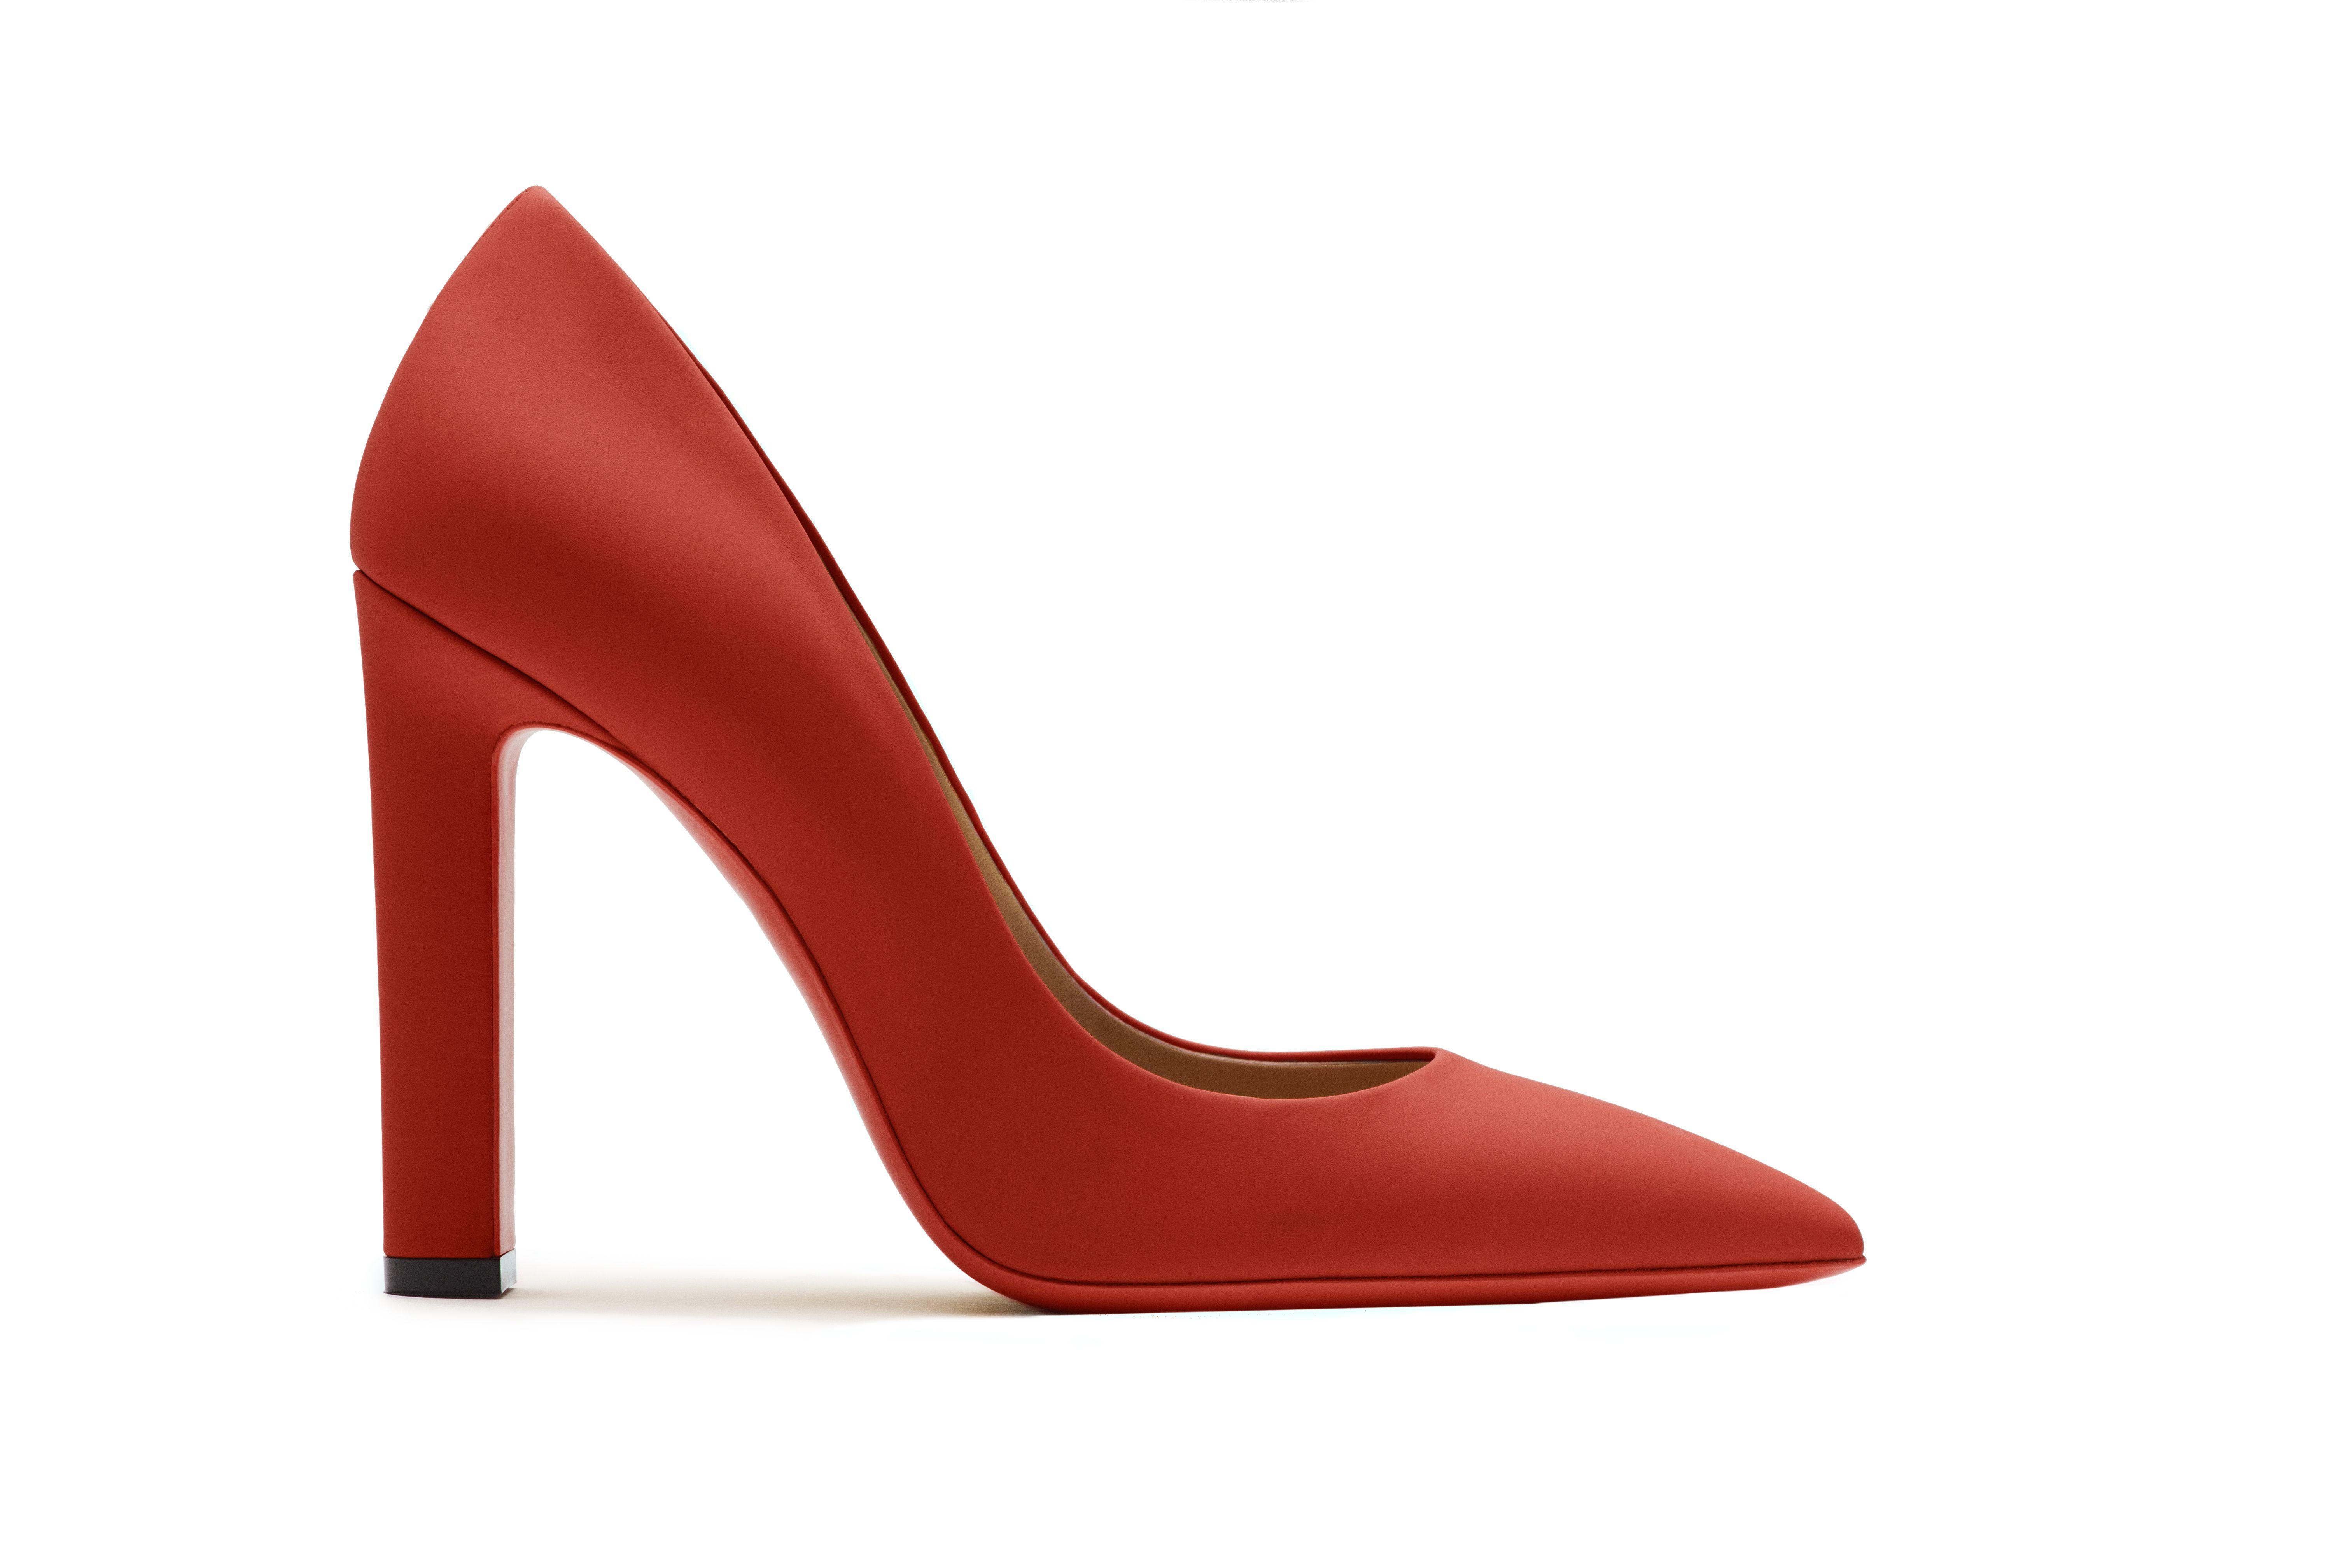 Rain Heels  SHOP NOW: http://www.bally.com/bally/search/COLOURFUL_PUMPS/woman/season/main/gender/D/collection_id/27247